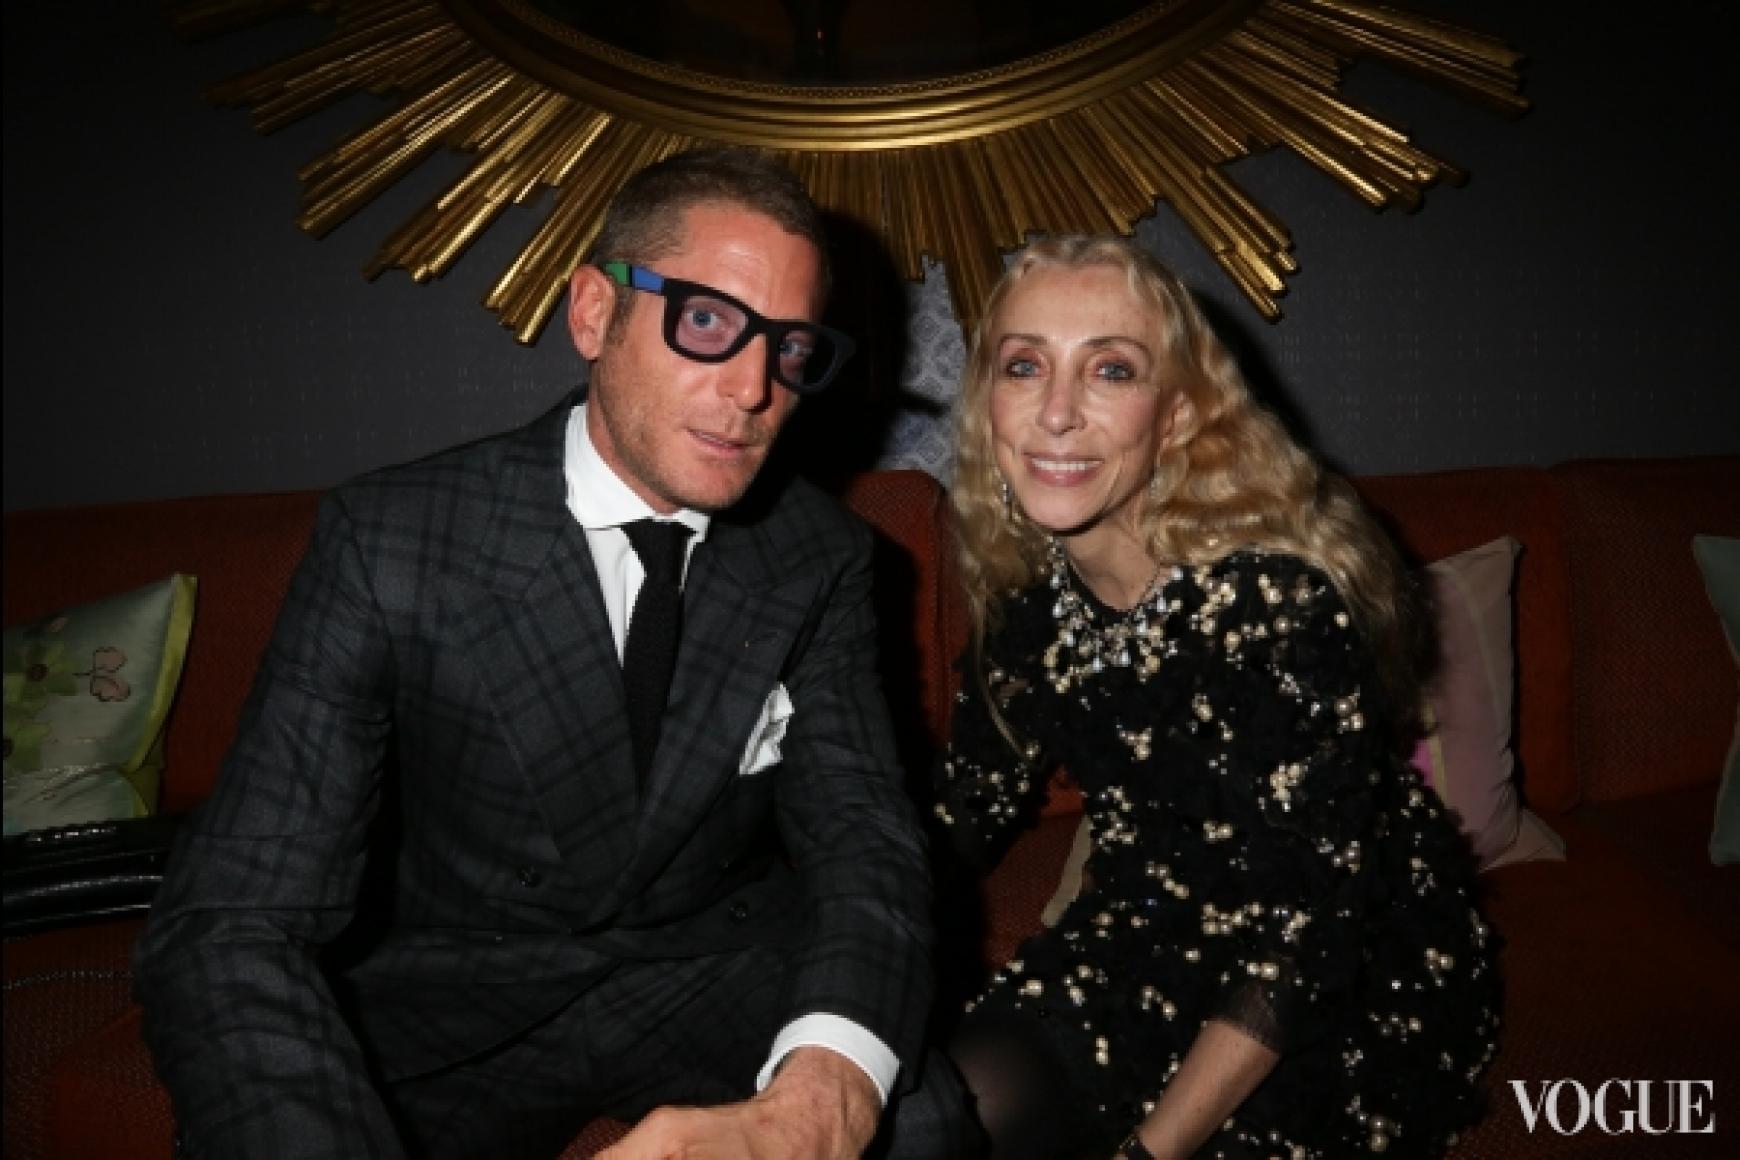 Лапо Элканн и Франка Соццани (Vogue Italy)